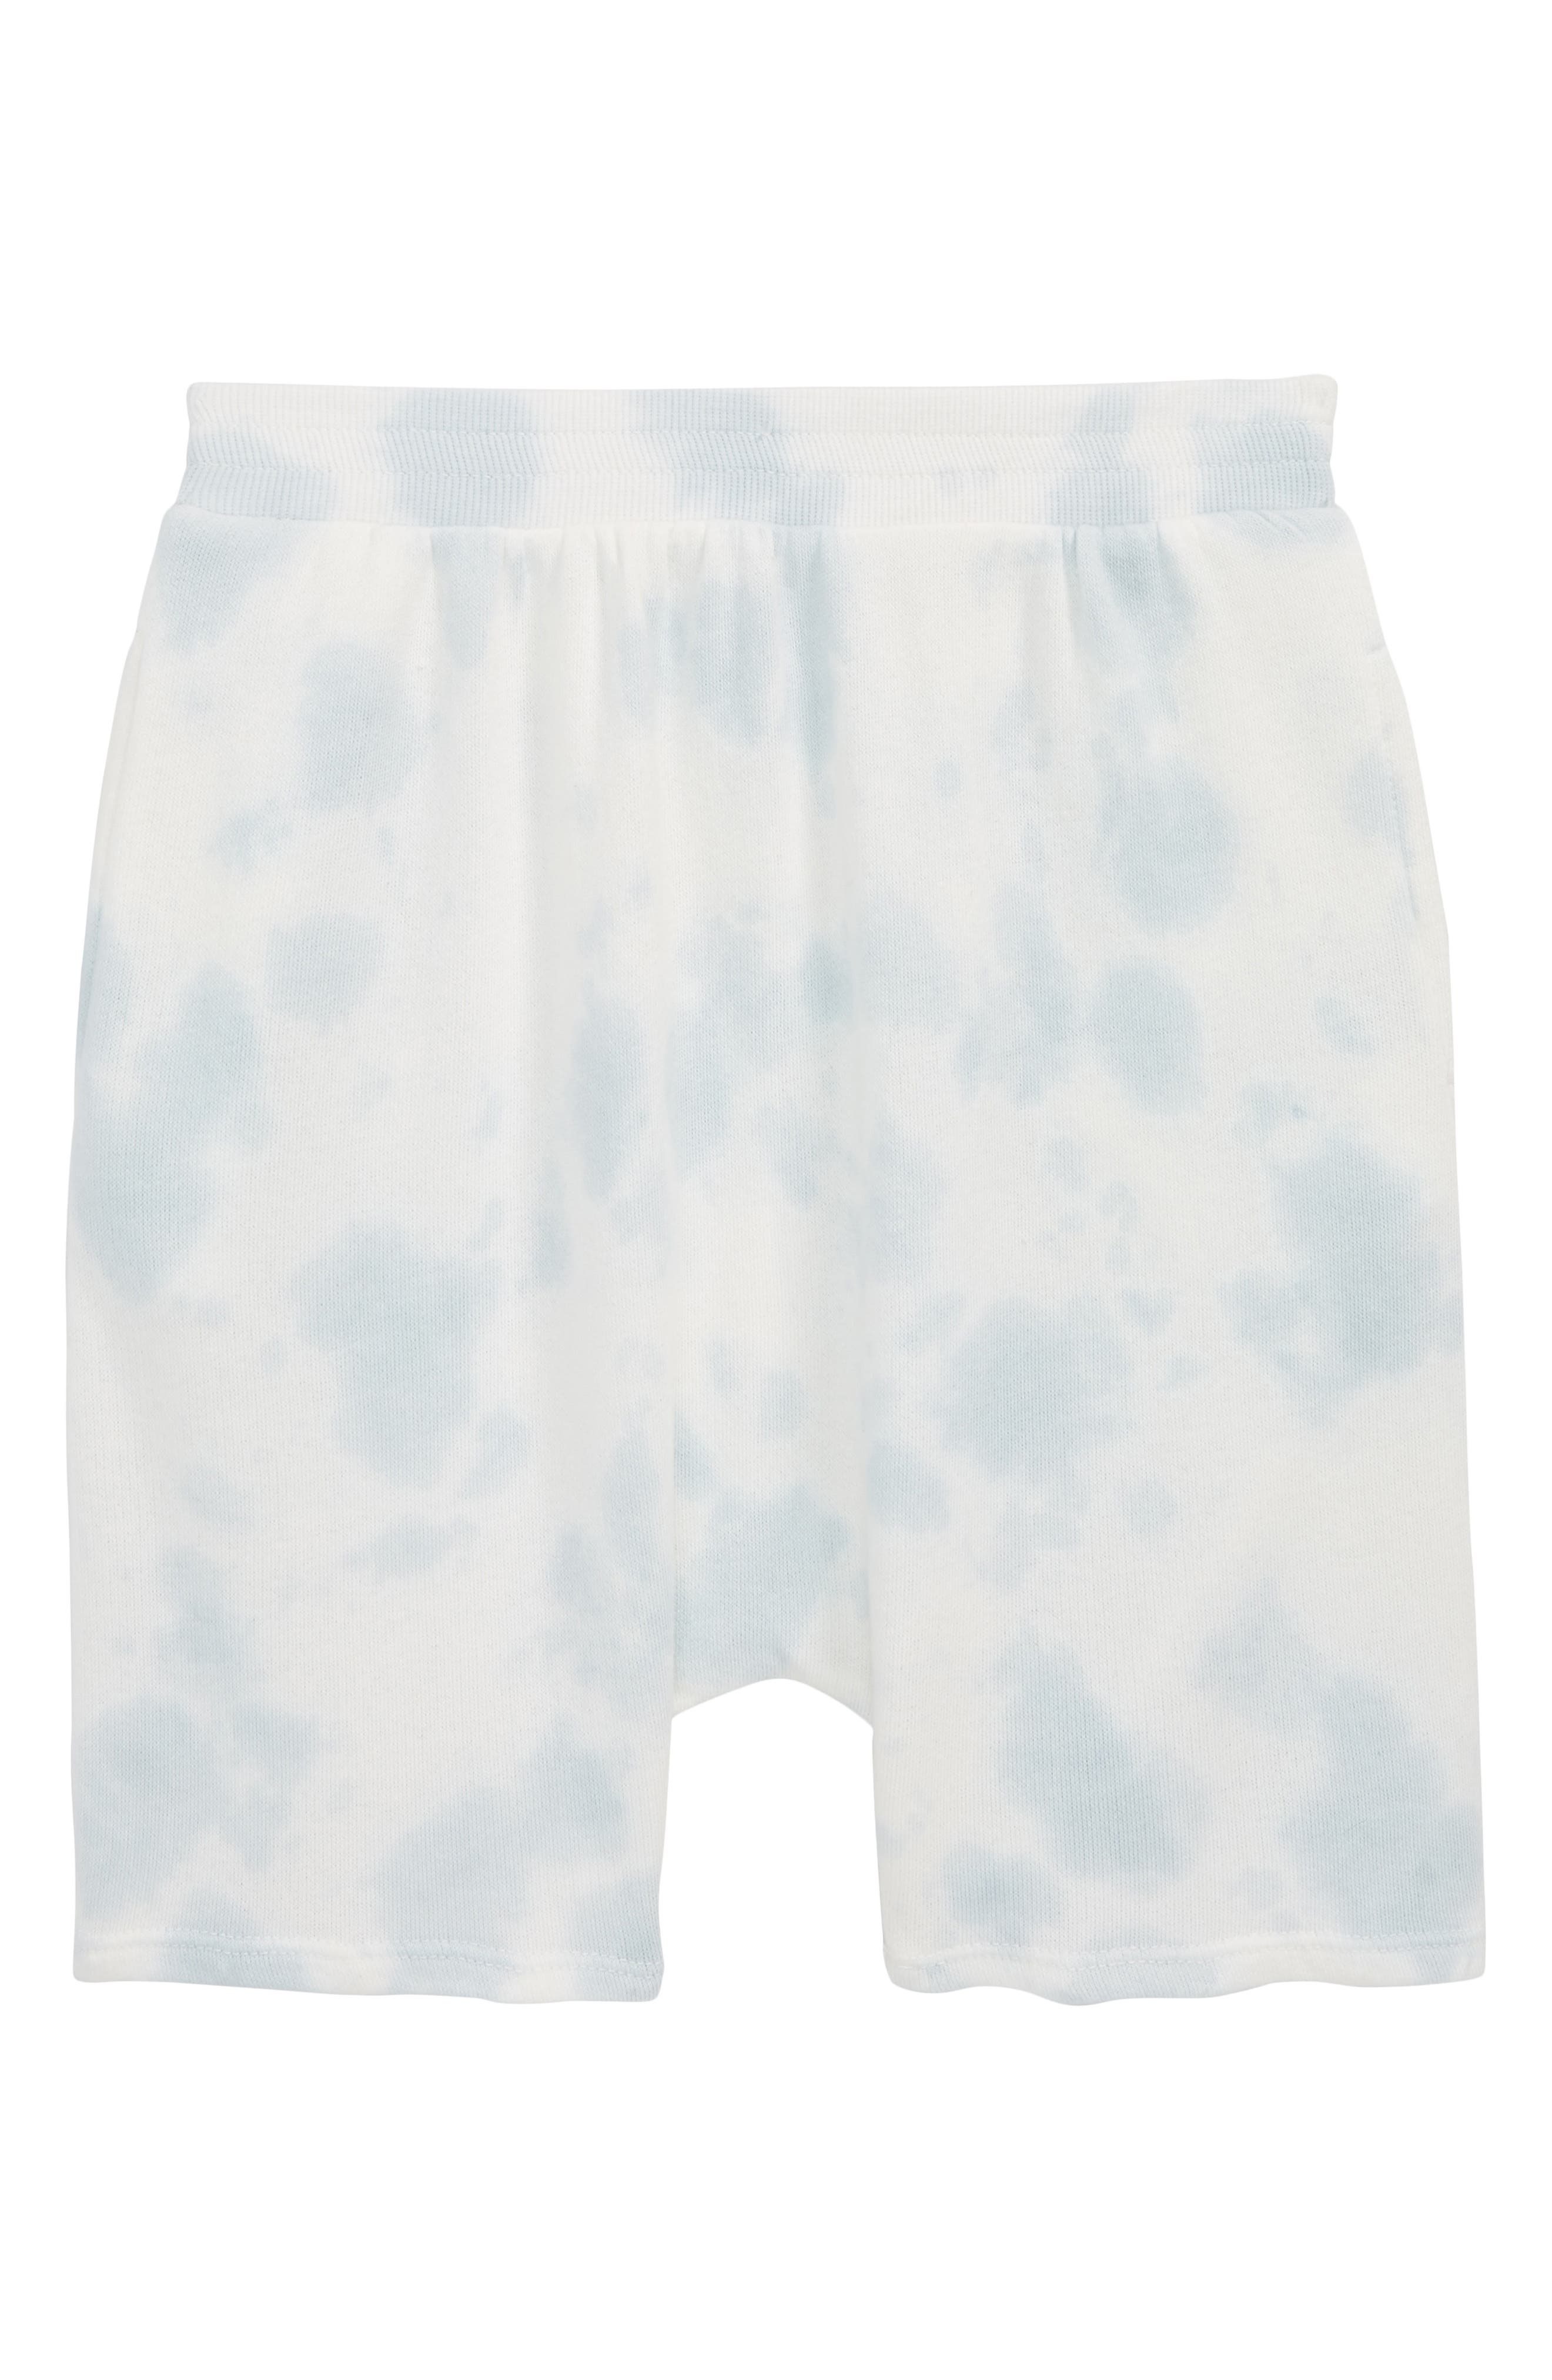 Tie Dye Shorts,                             Main thumbnail 1, color,                             Blue Fog Tie Dye